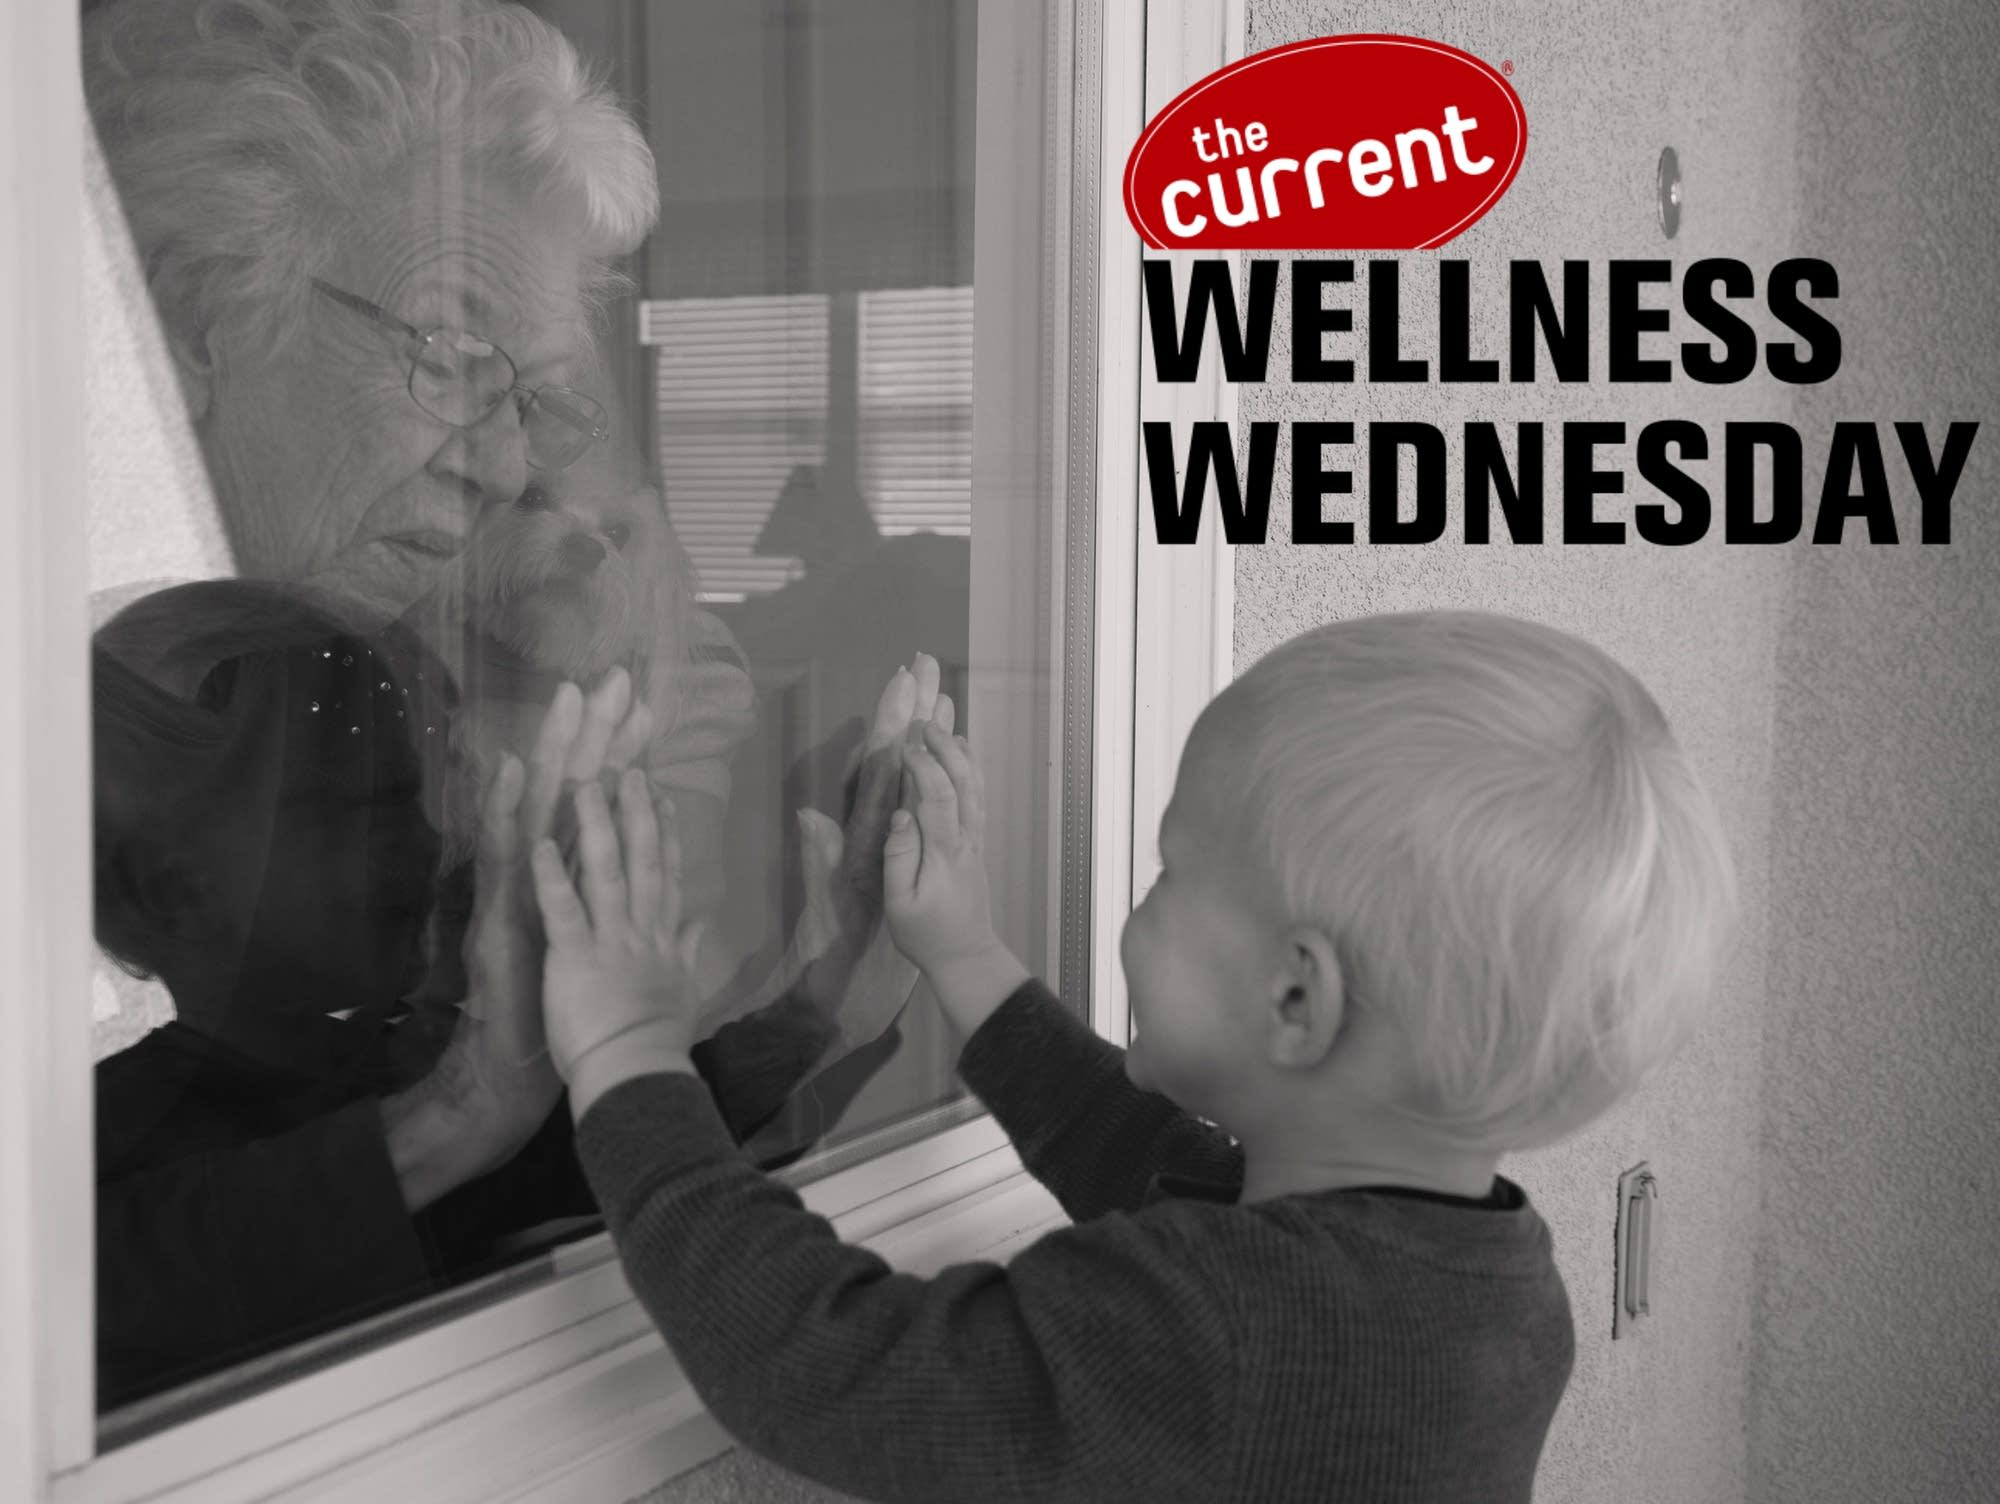 A child greets a senior through a closed window.